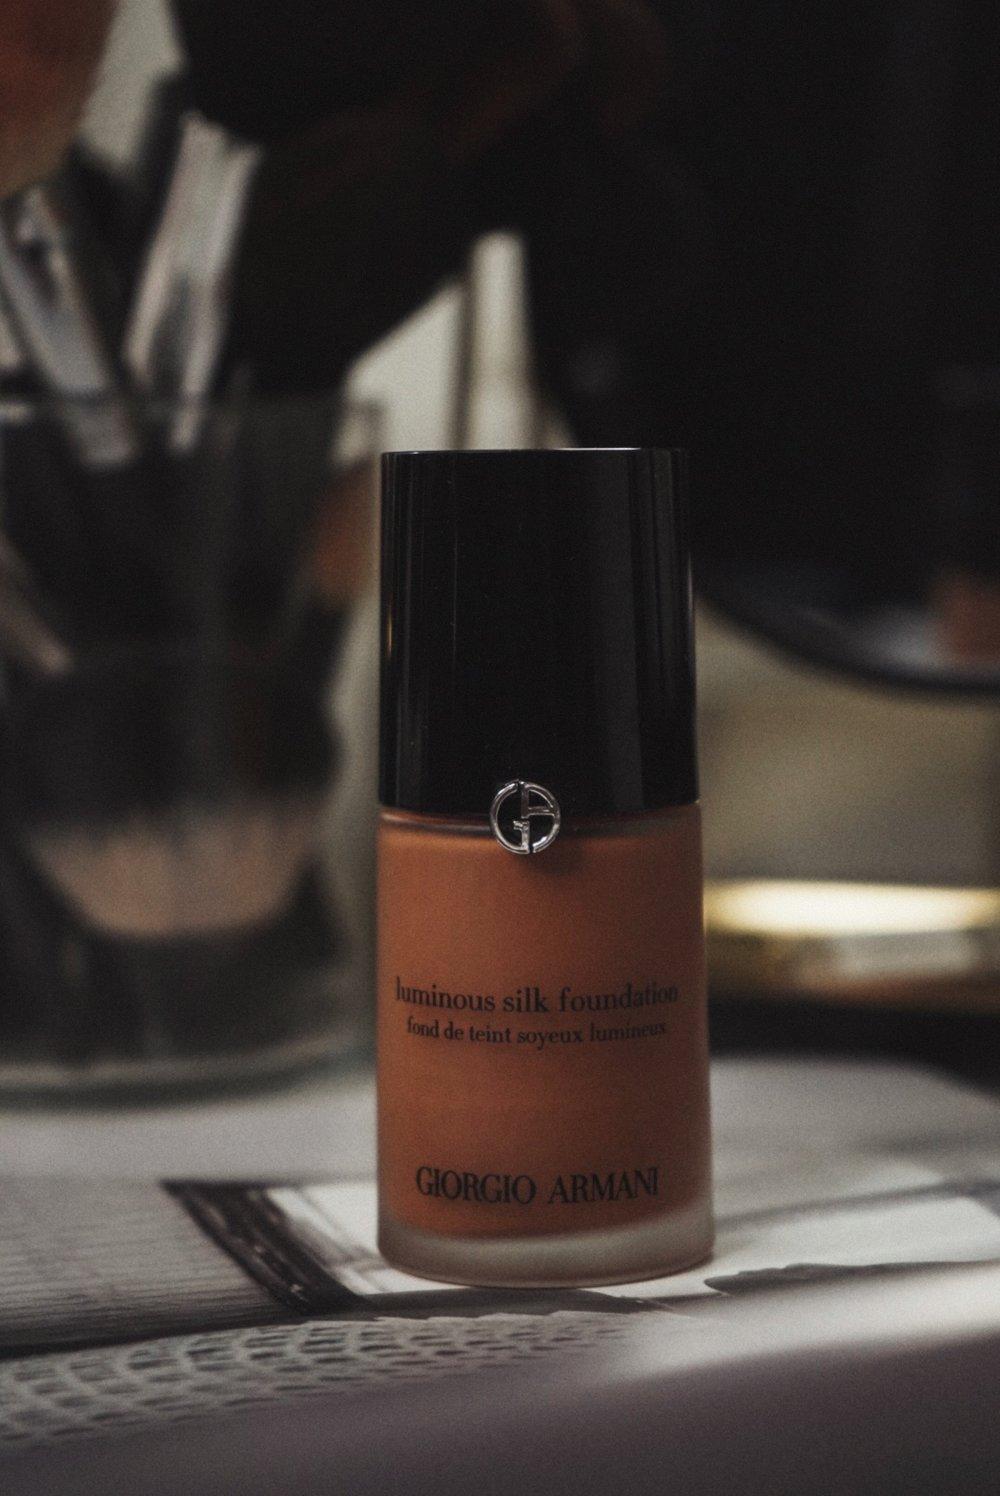 TashaJames-TheGlossier-Top-Foundations-Makeup-24.JPG